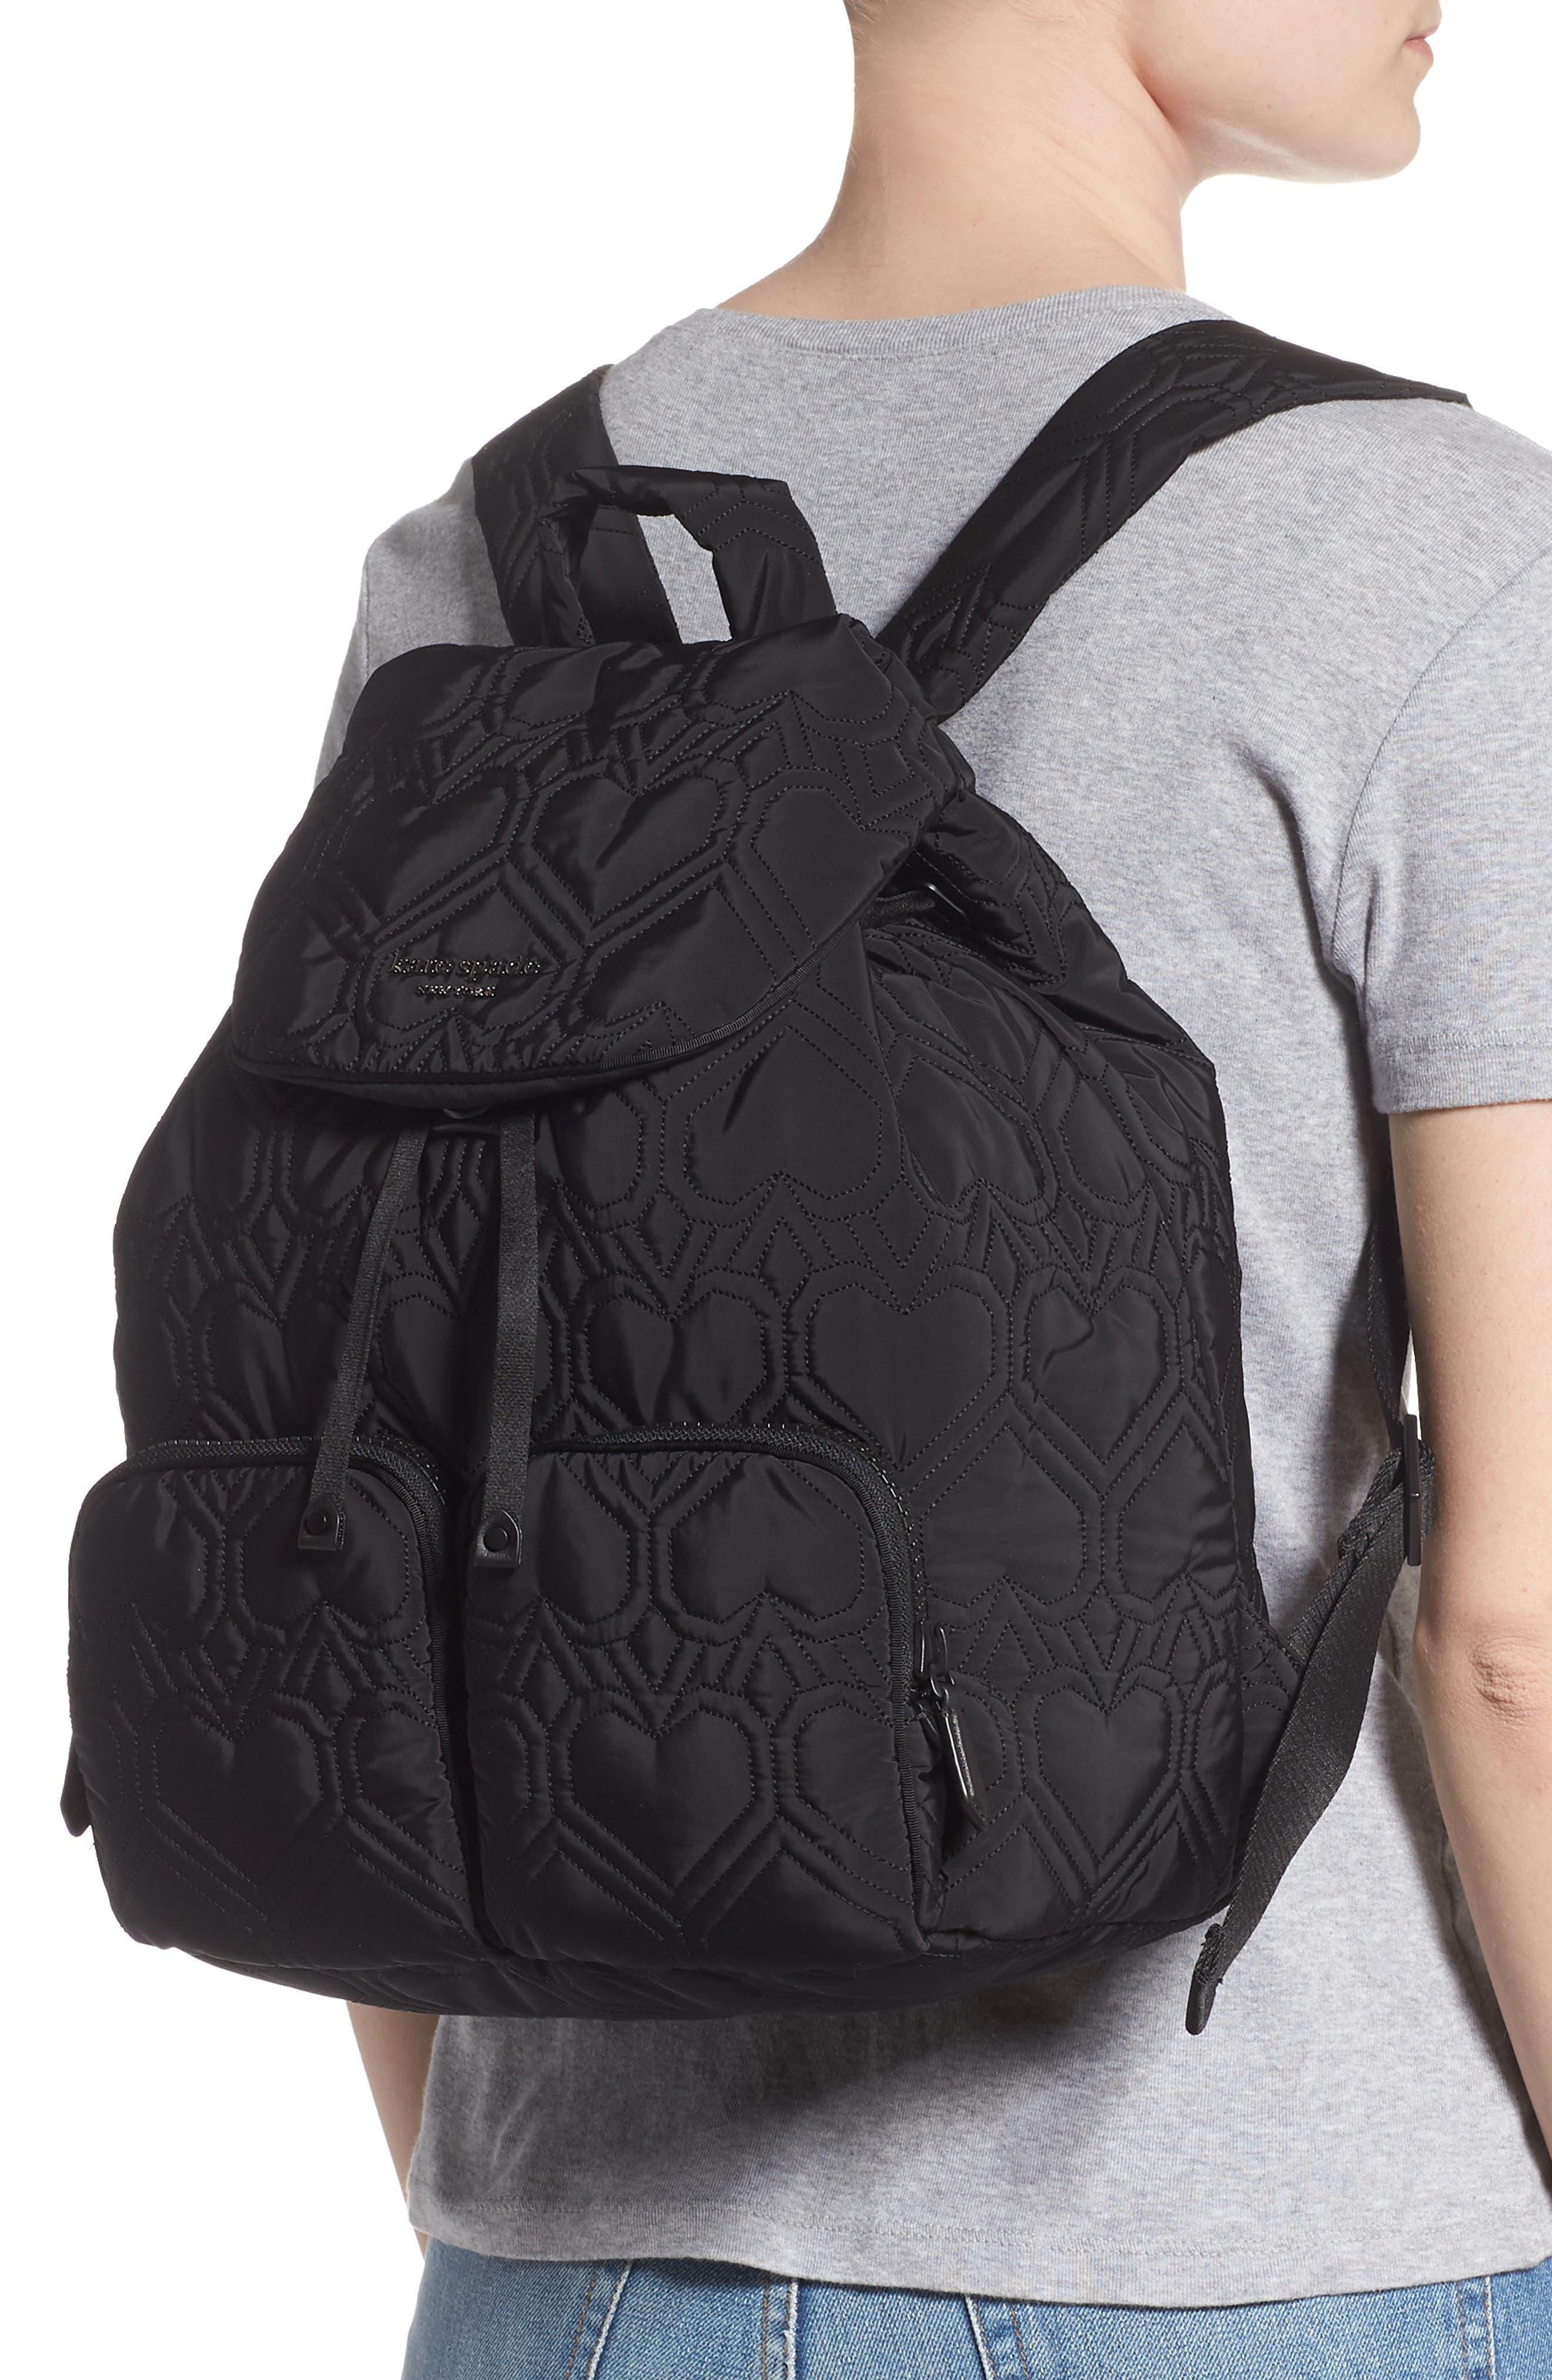 KATE SPADE NEW YORK, large jayne quilted nylon backpack, Alternate thumbnail 2, color, BLACK